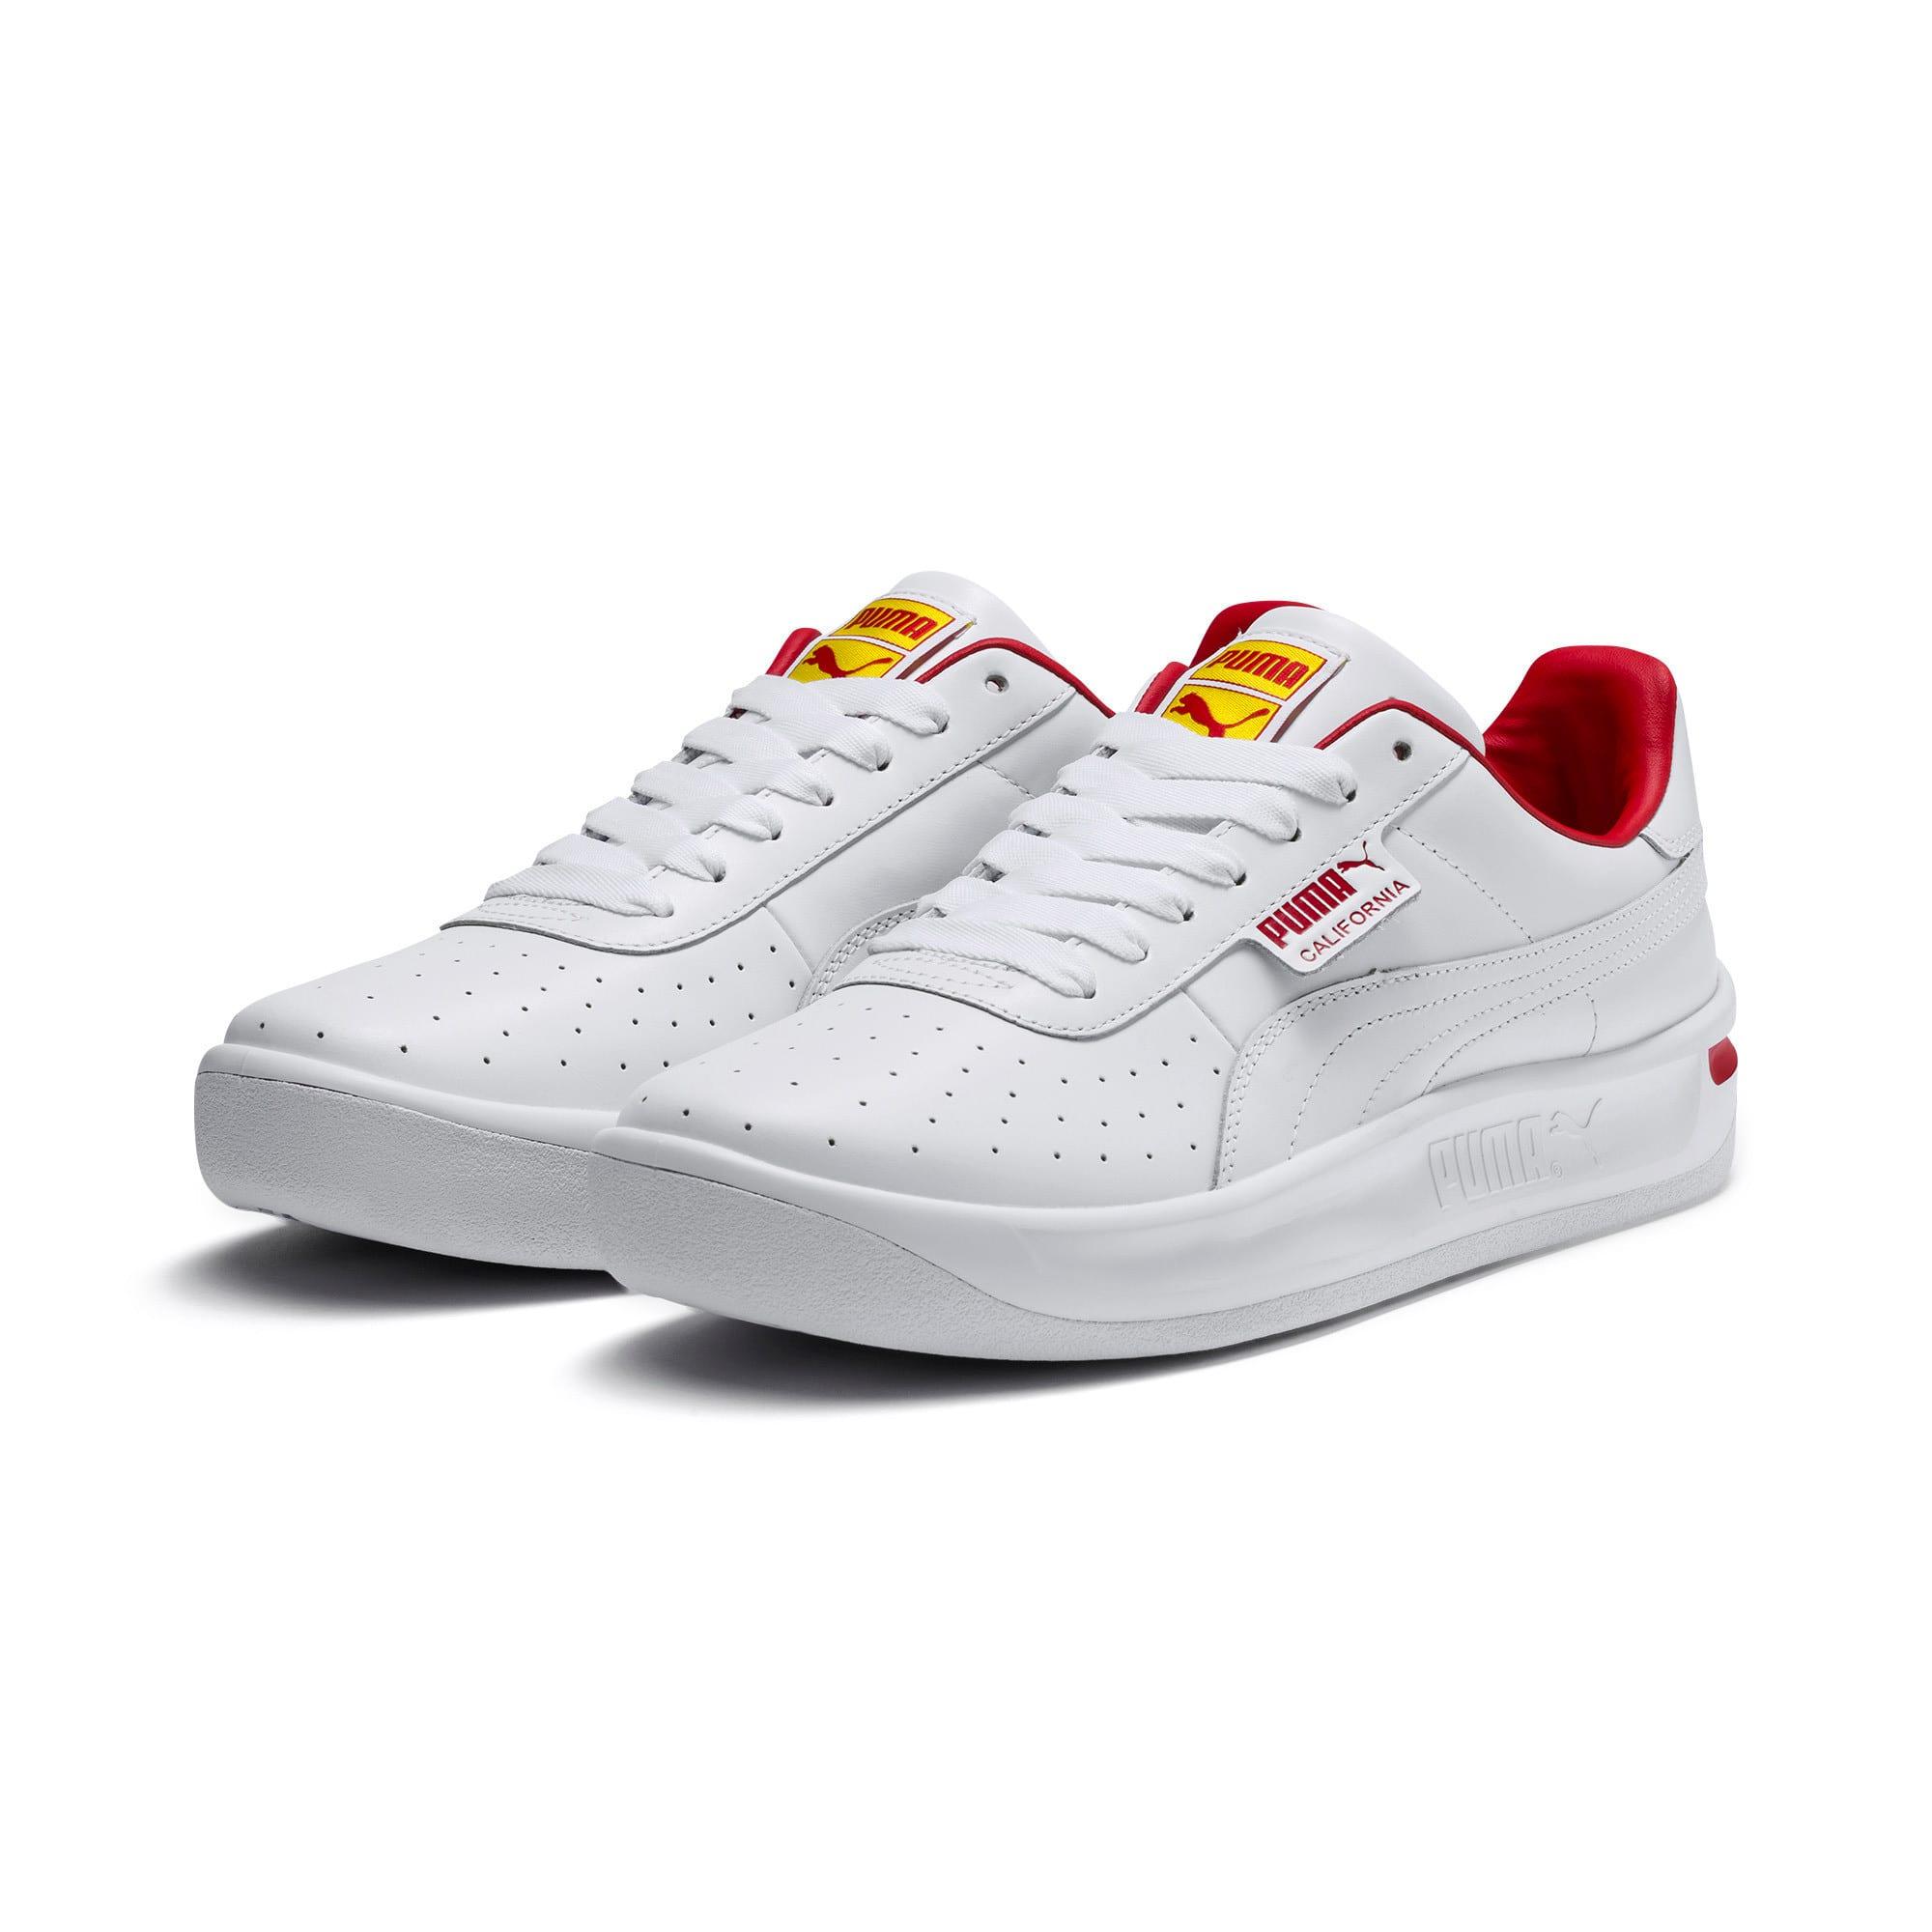 Thumbnail 3 of California Drive Thru Shoes, P Wht-HighRiskRed-Blazg Yelw, medium